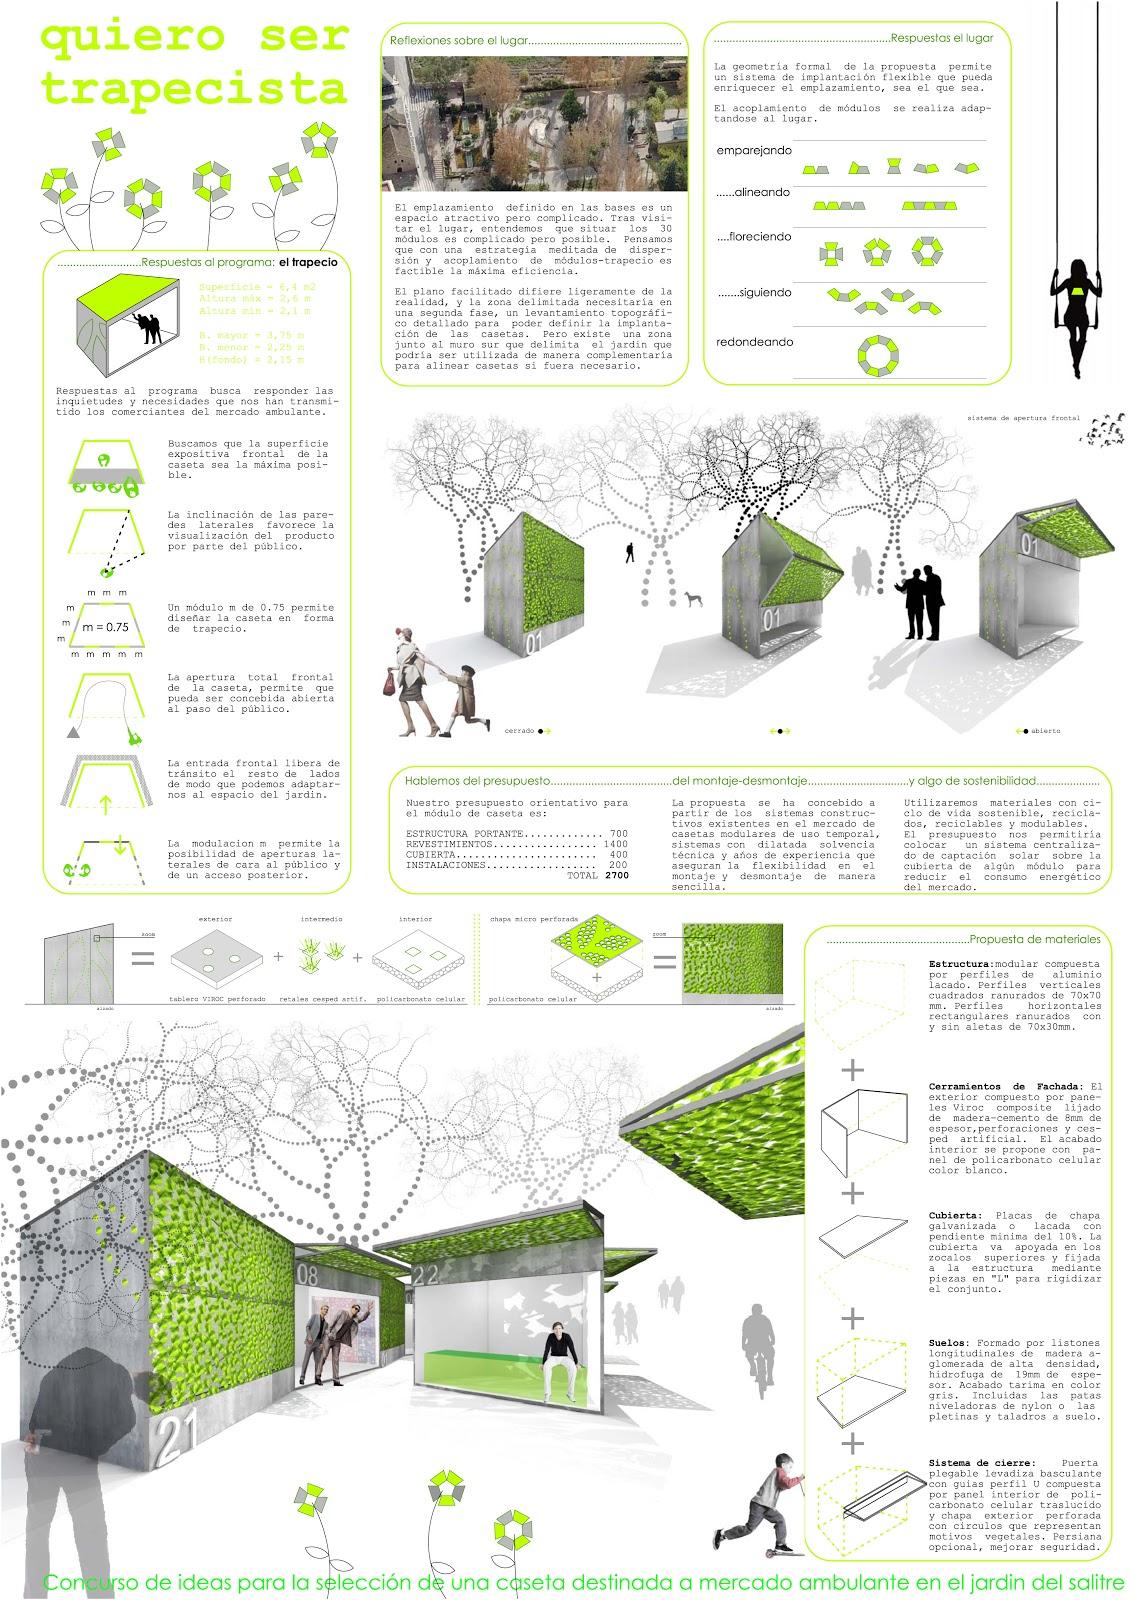 Estudio de arquitectura antonio jurado blog - Estudios de arquitectura malaga ...